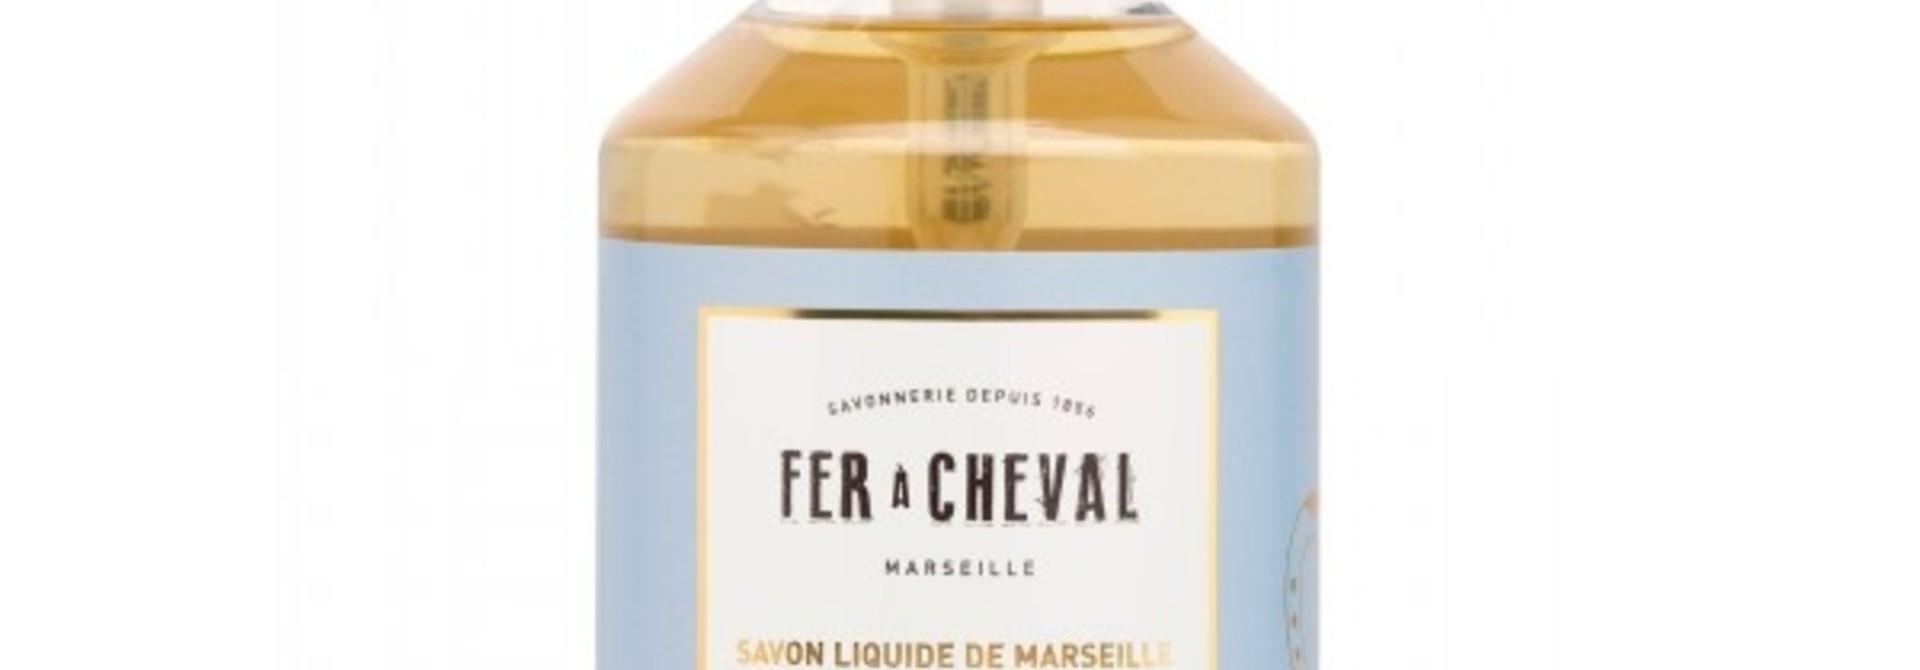 Vloeibare geparfumeerde marseille zeep met Citrus & ceder 500ml